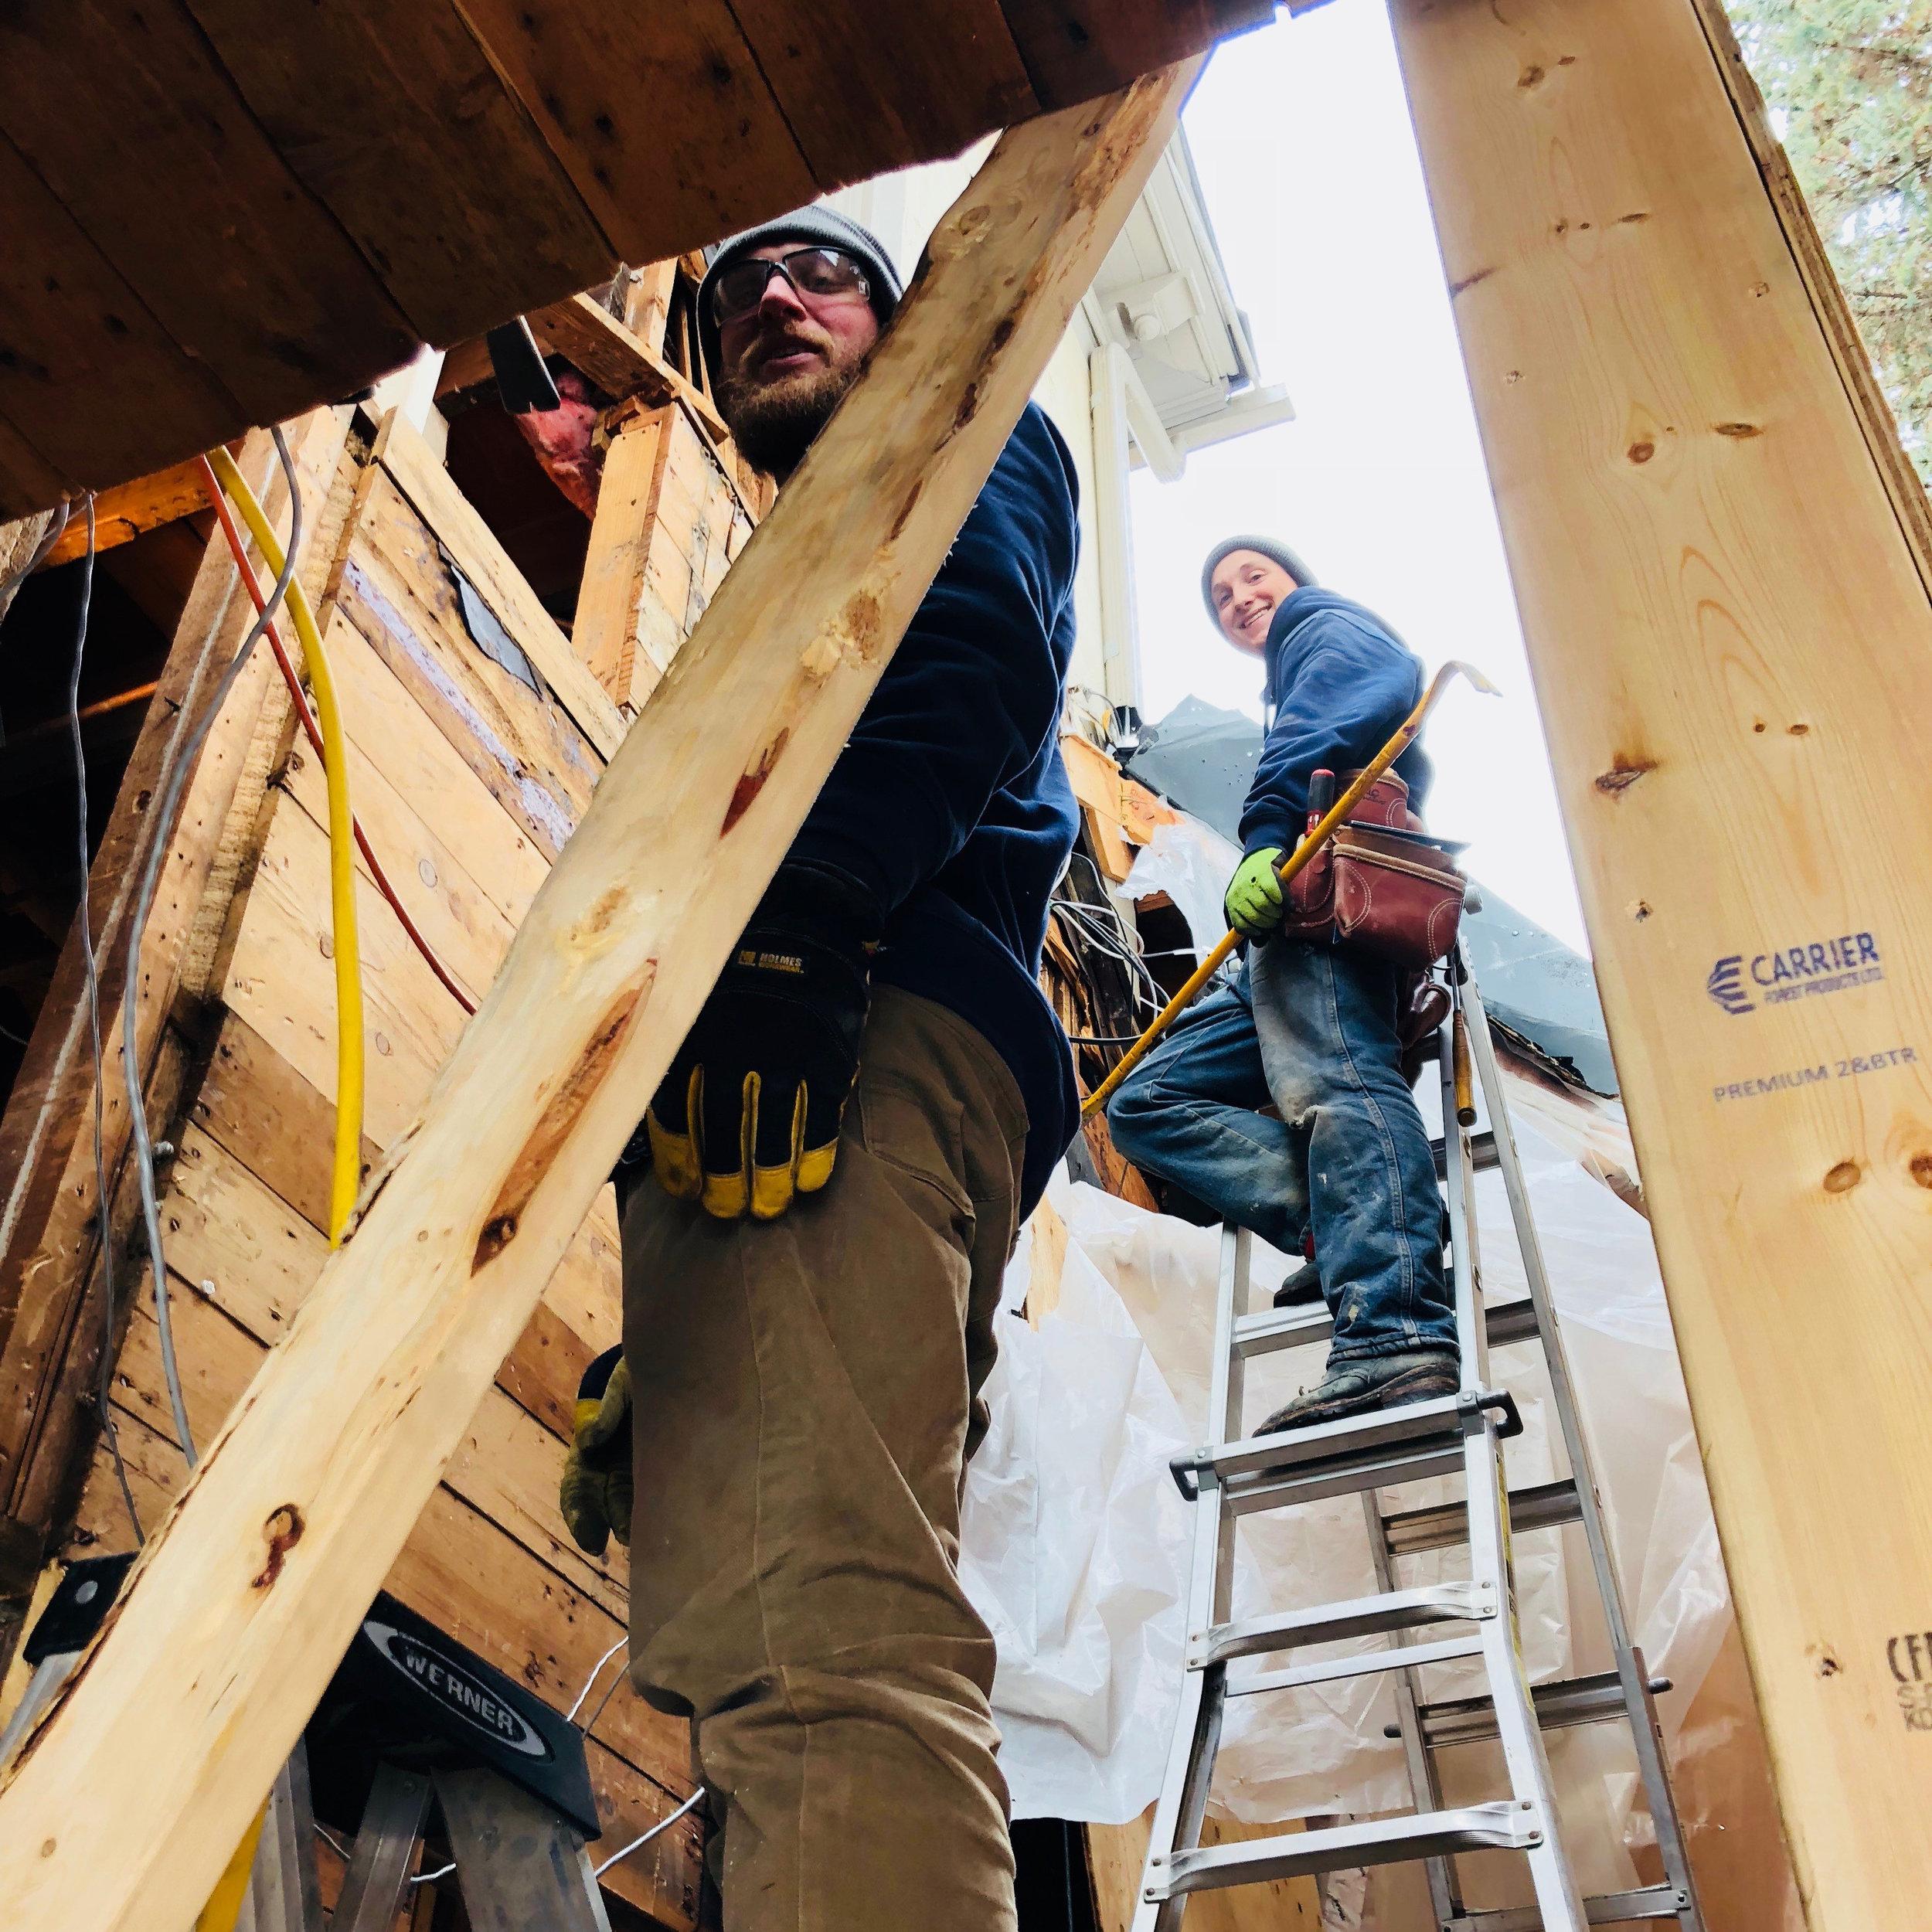 Carpenters on ladders